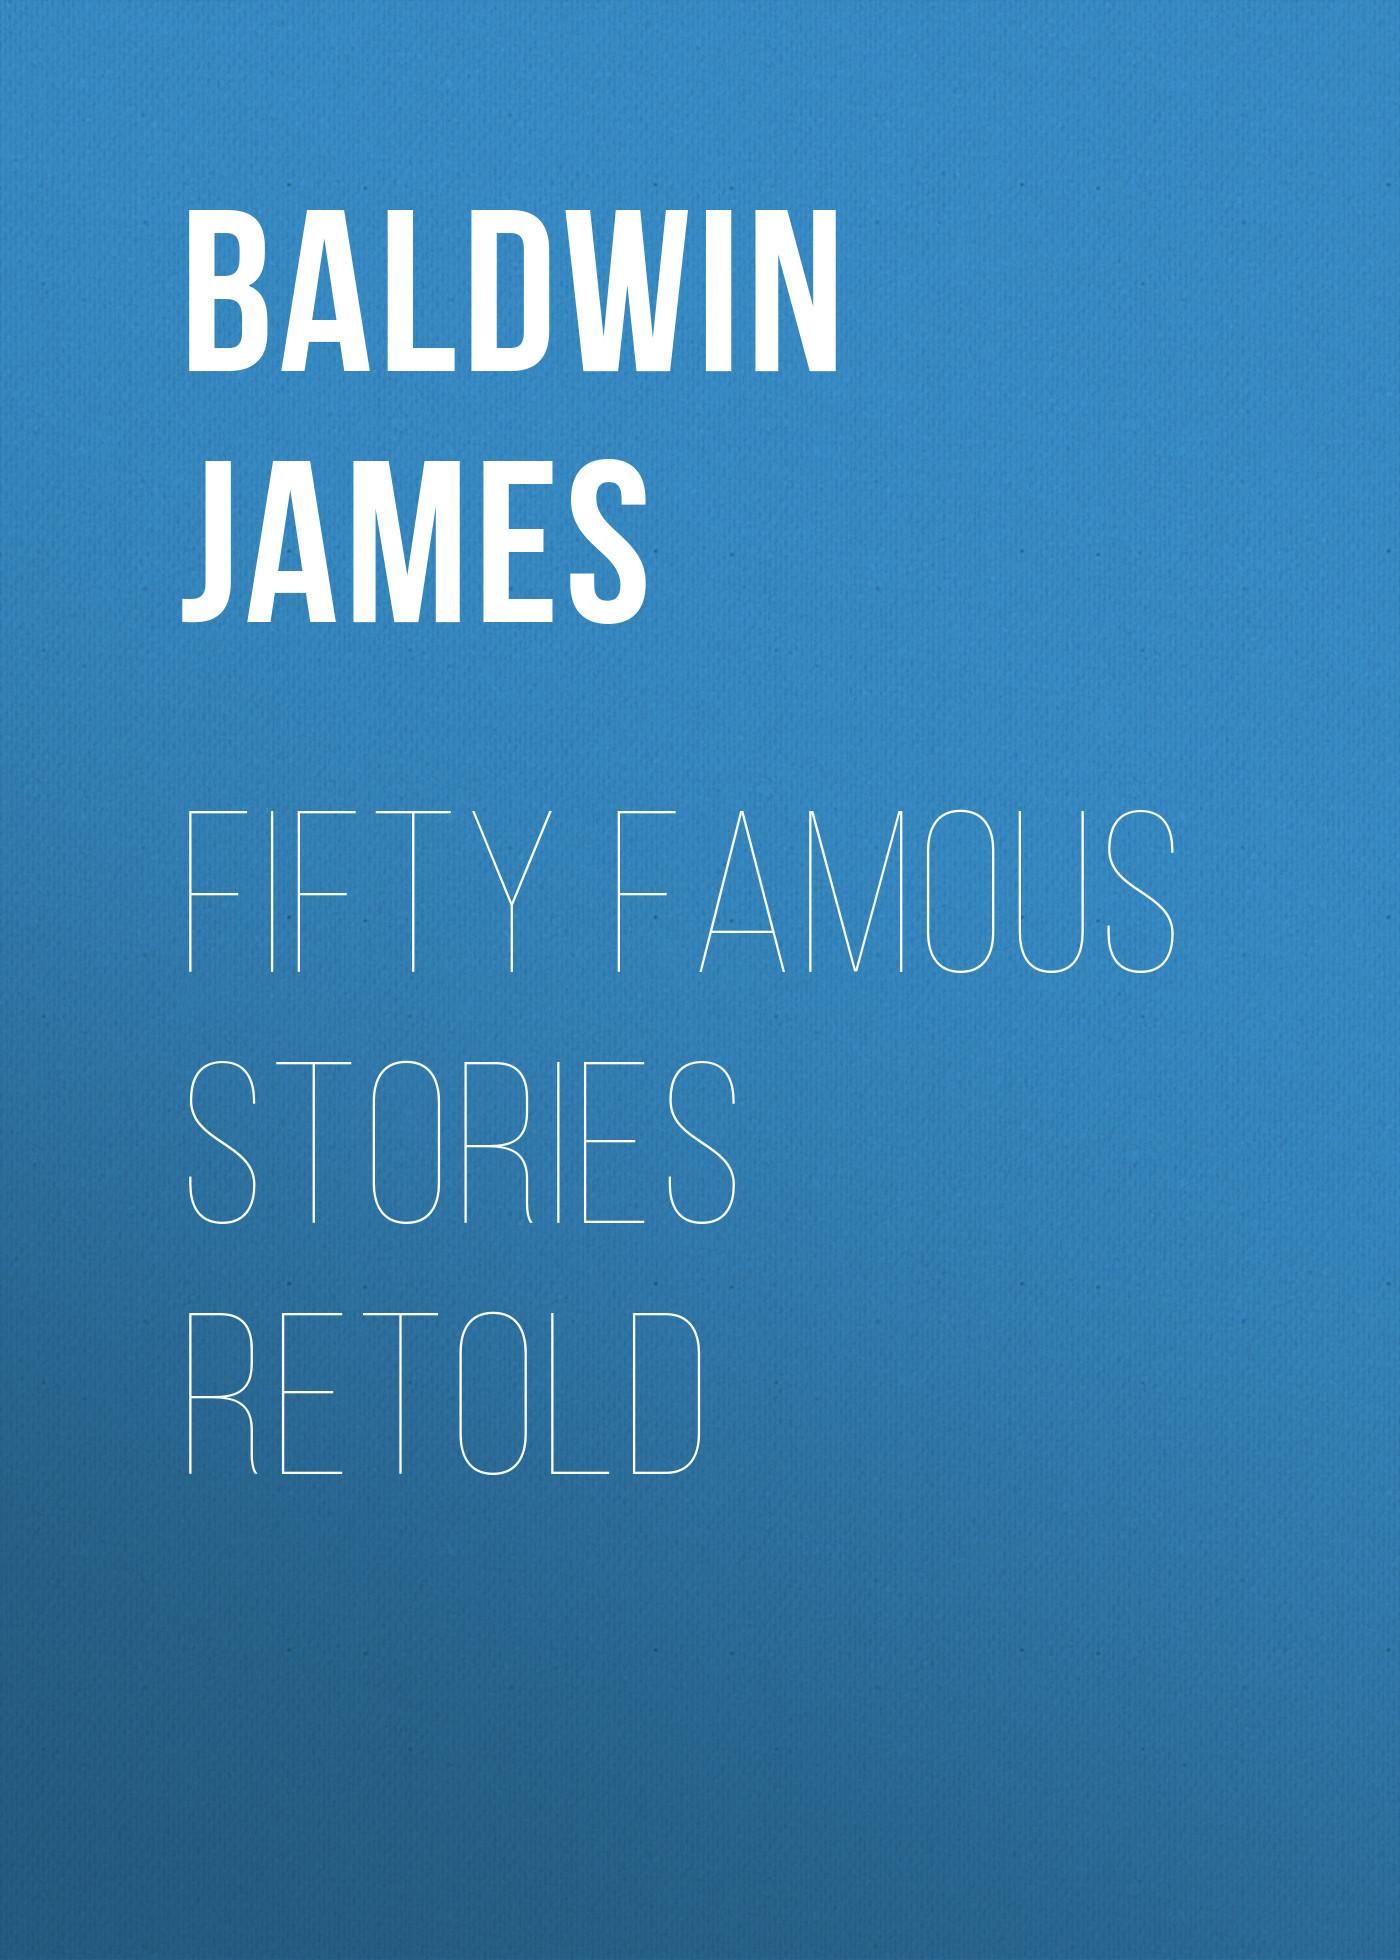 Baldwin James Fifty Famous Stories Retold vitaly mushkin erotic stories top ten